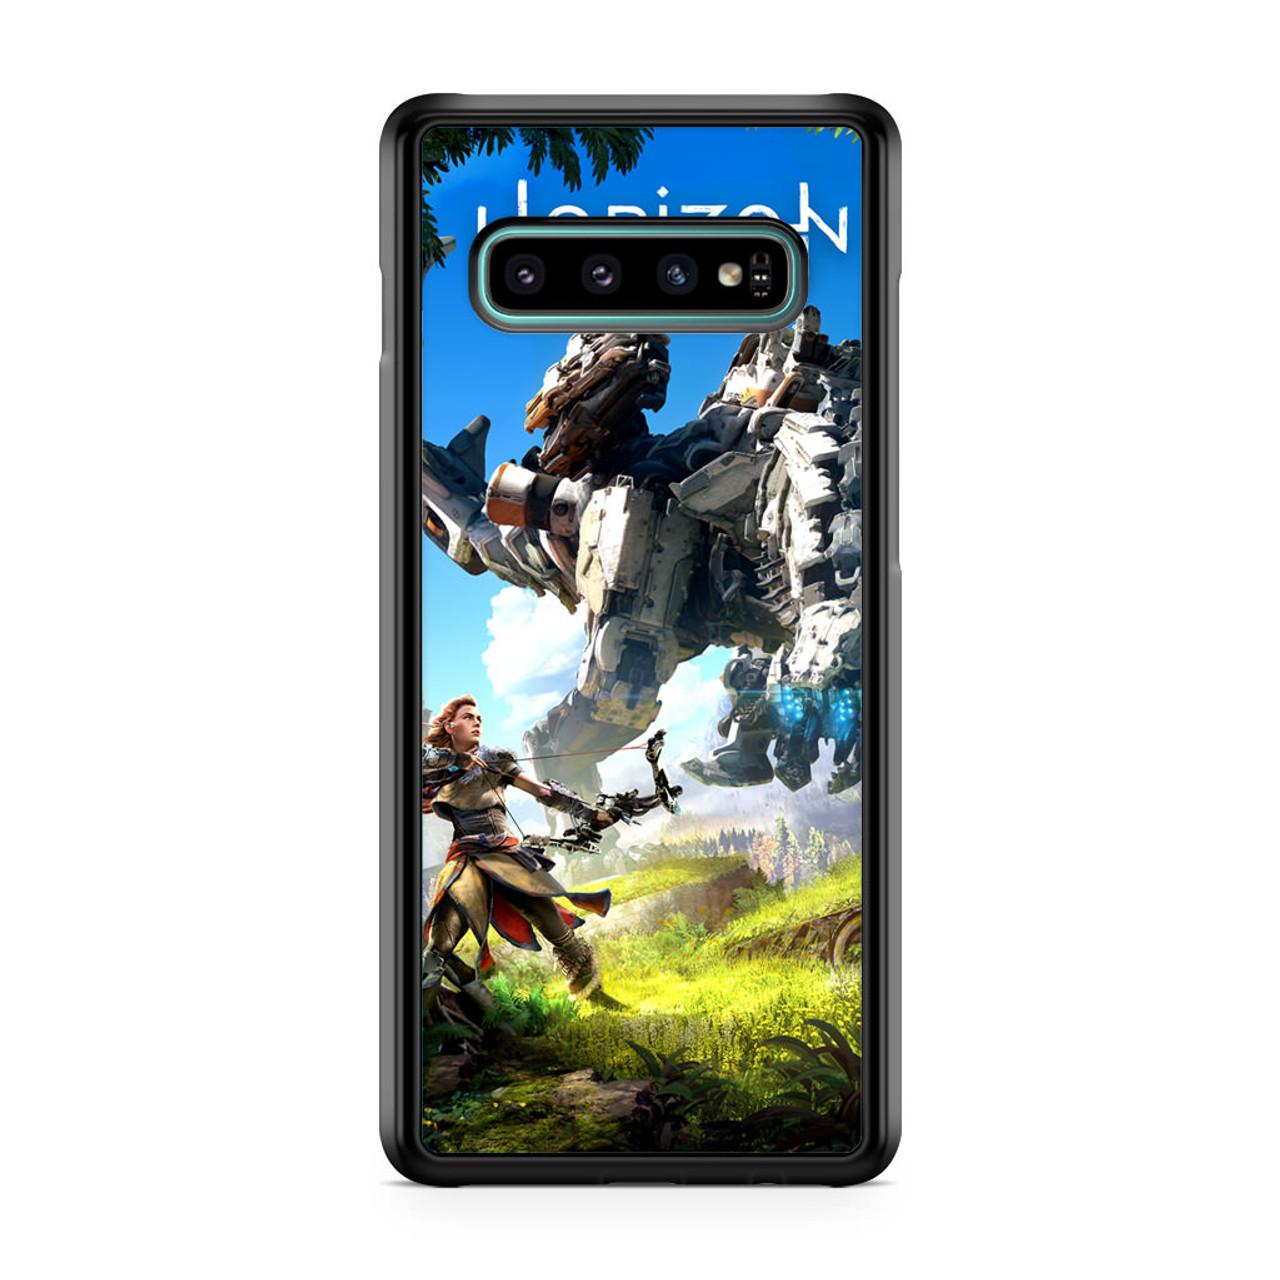 Horizon Zero Dawn Wallpaper Samsung Galaxy S10 Plus Case Jocases